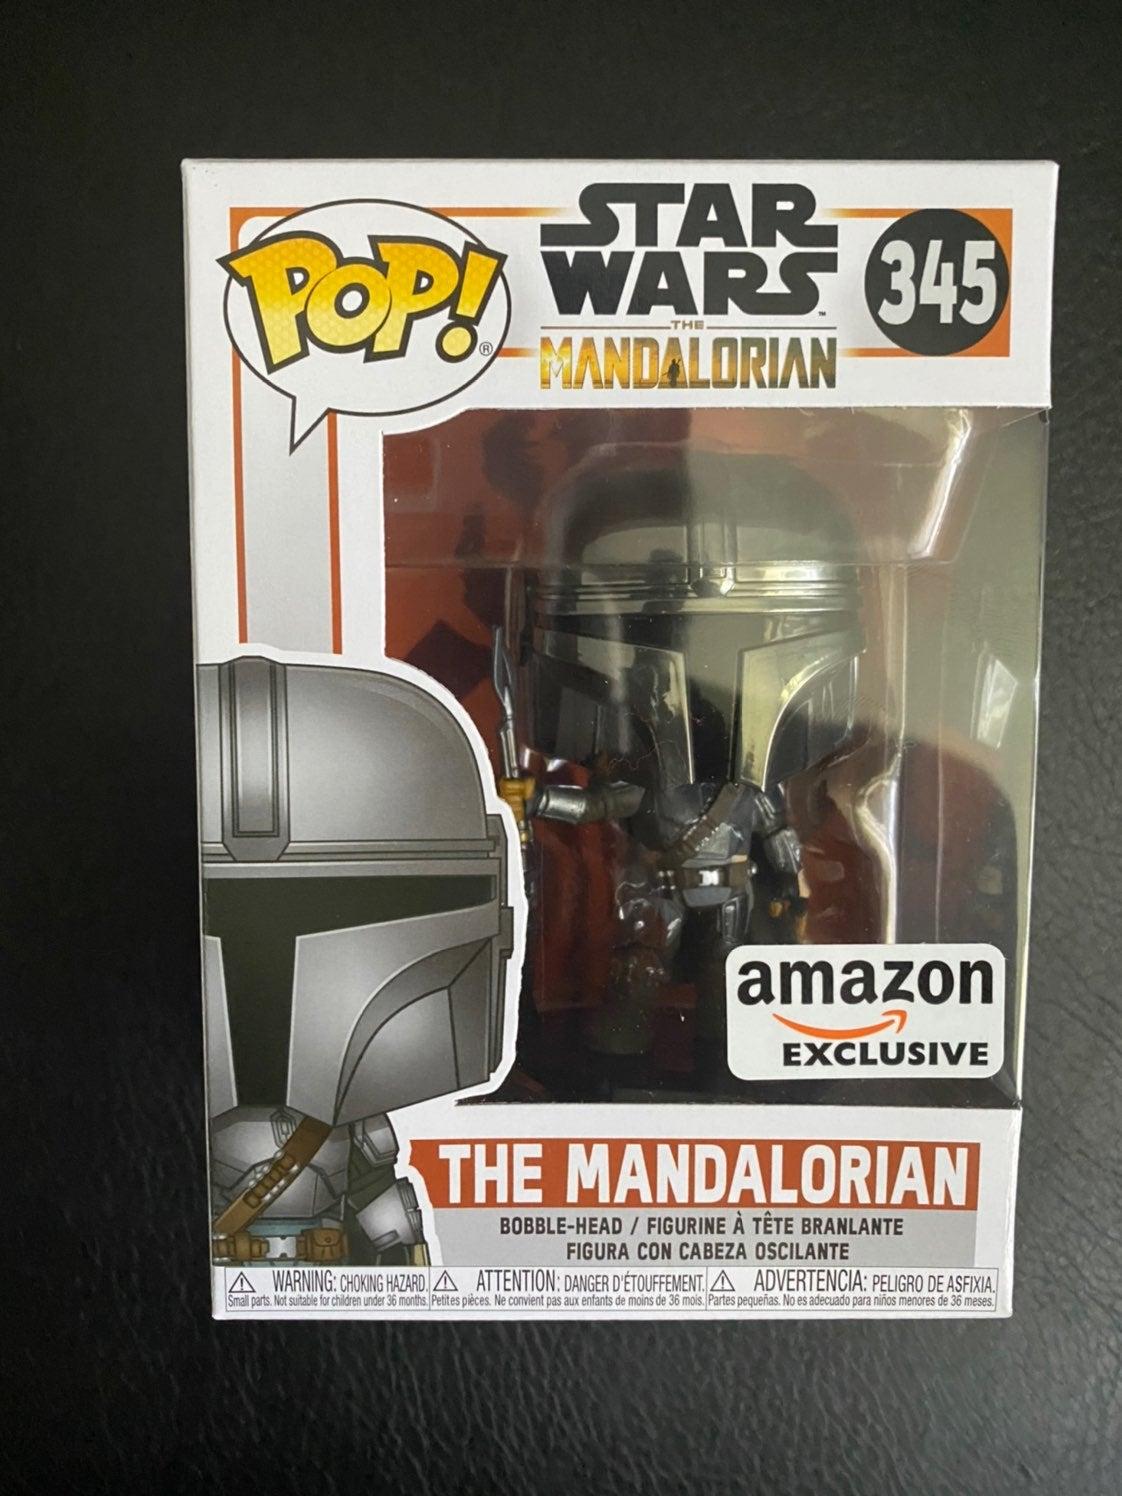 Funko Pop! Star Wars Mandalorian Amazon